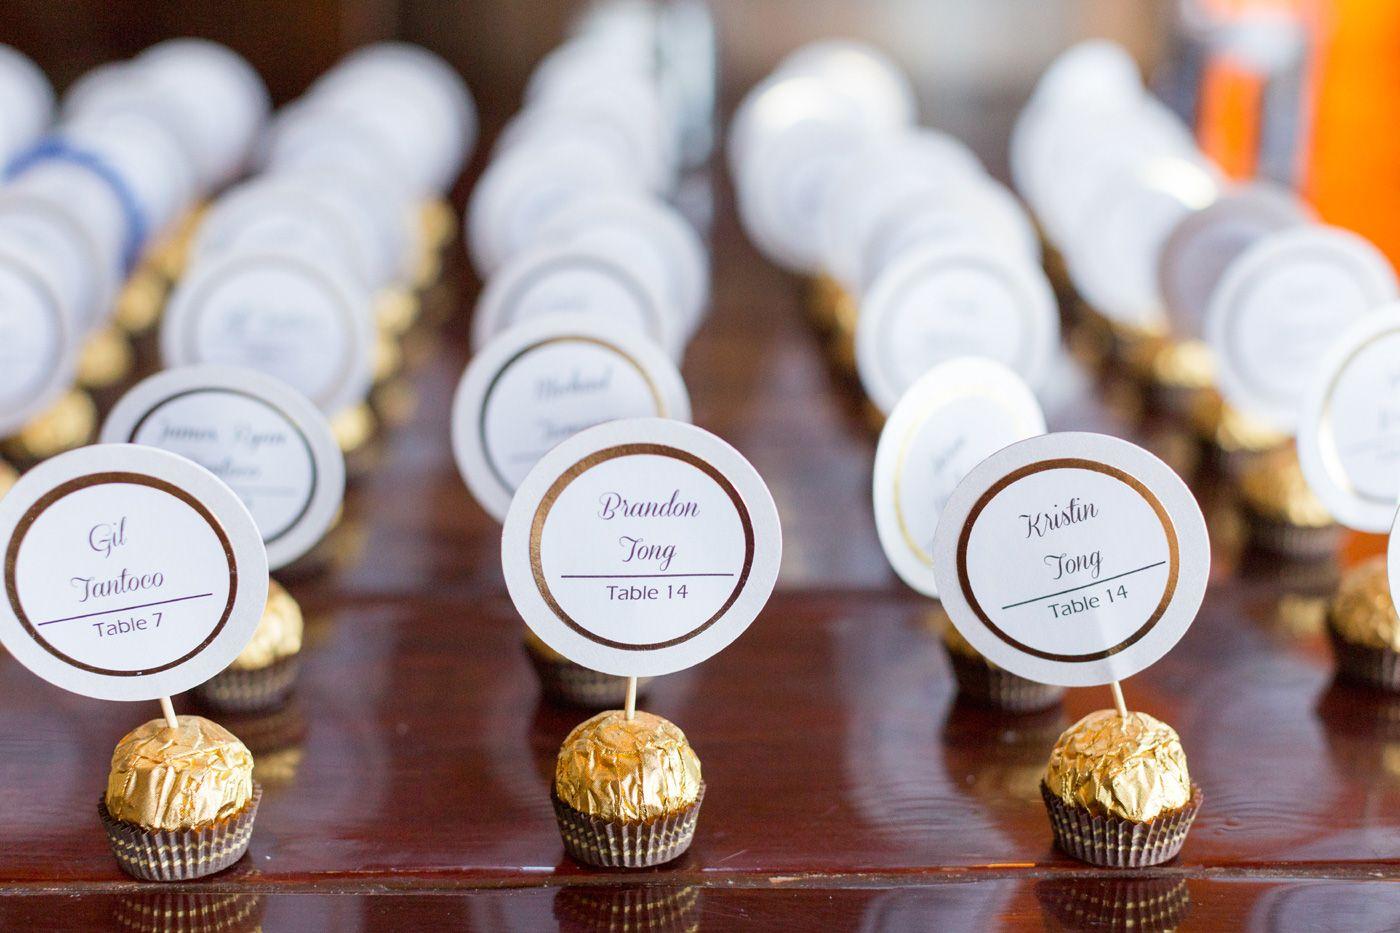 Tischkarten hochzeit selbst gestalten wedding weddings - Tischkarten ideen ...